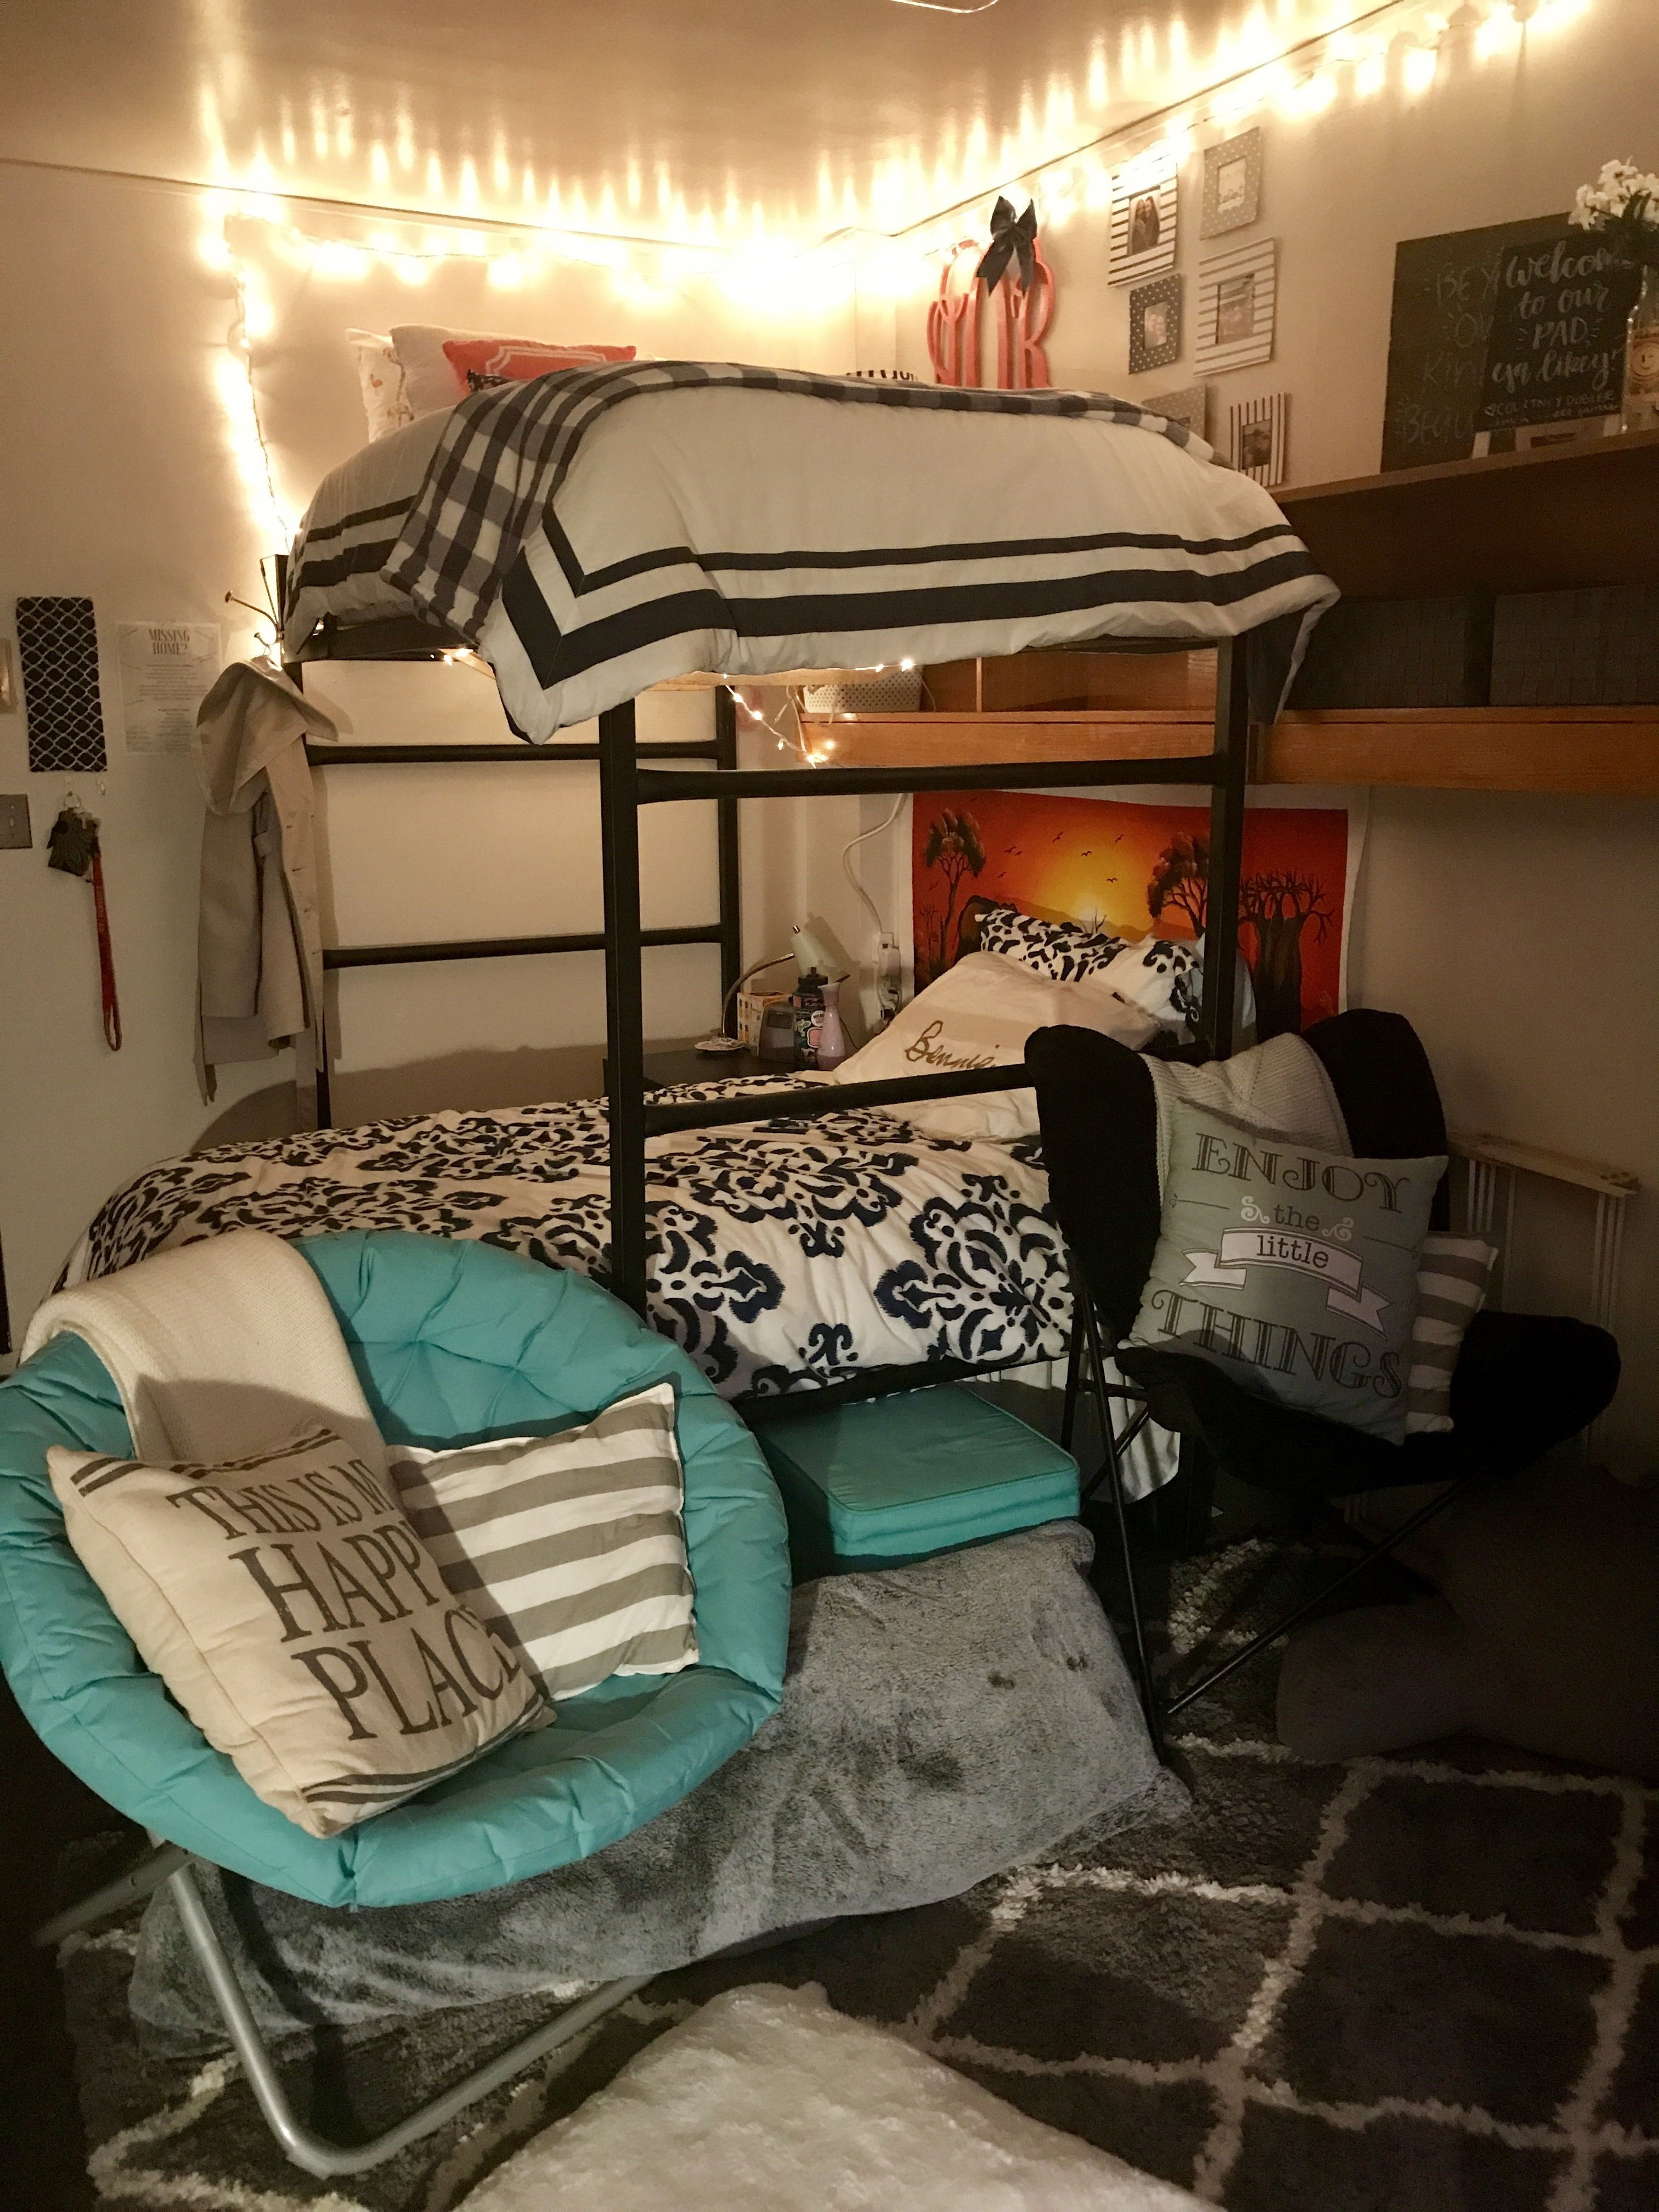 Preppy, navy, white, turquoise, coral freshman dorm room